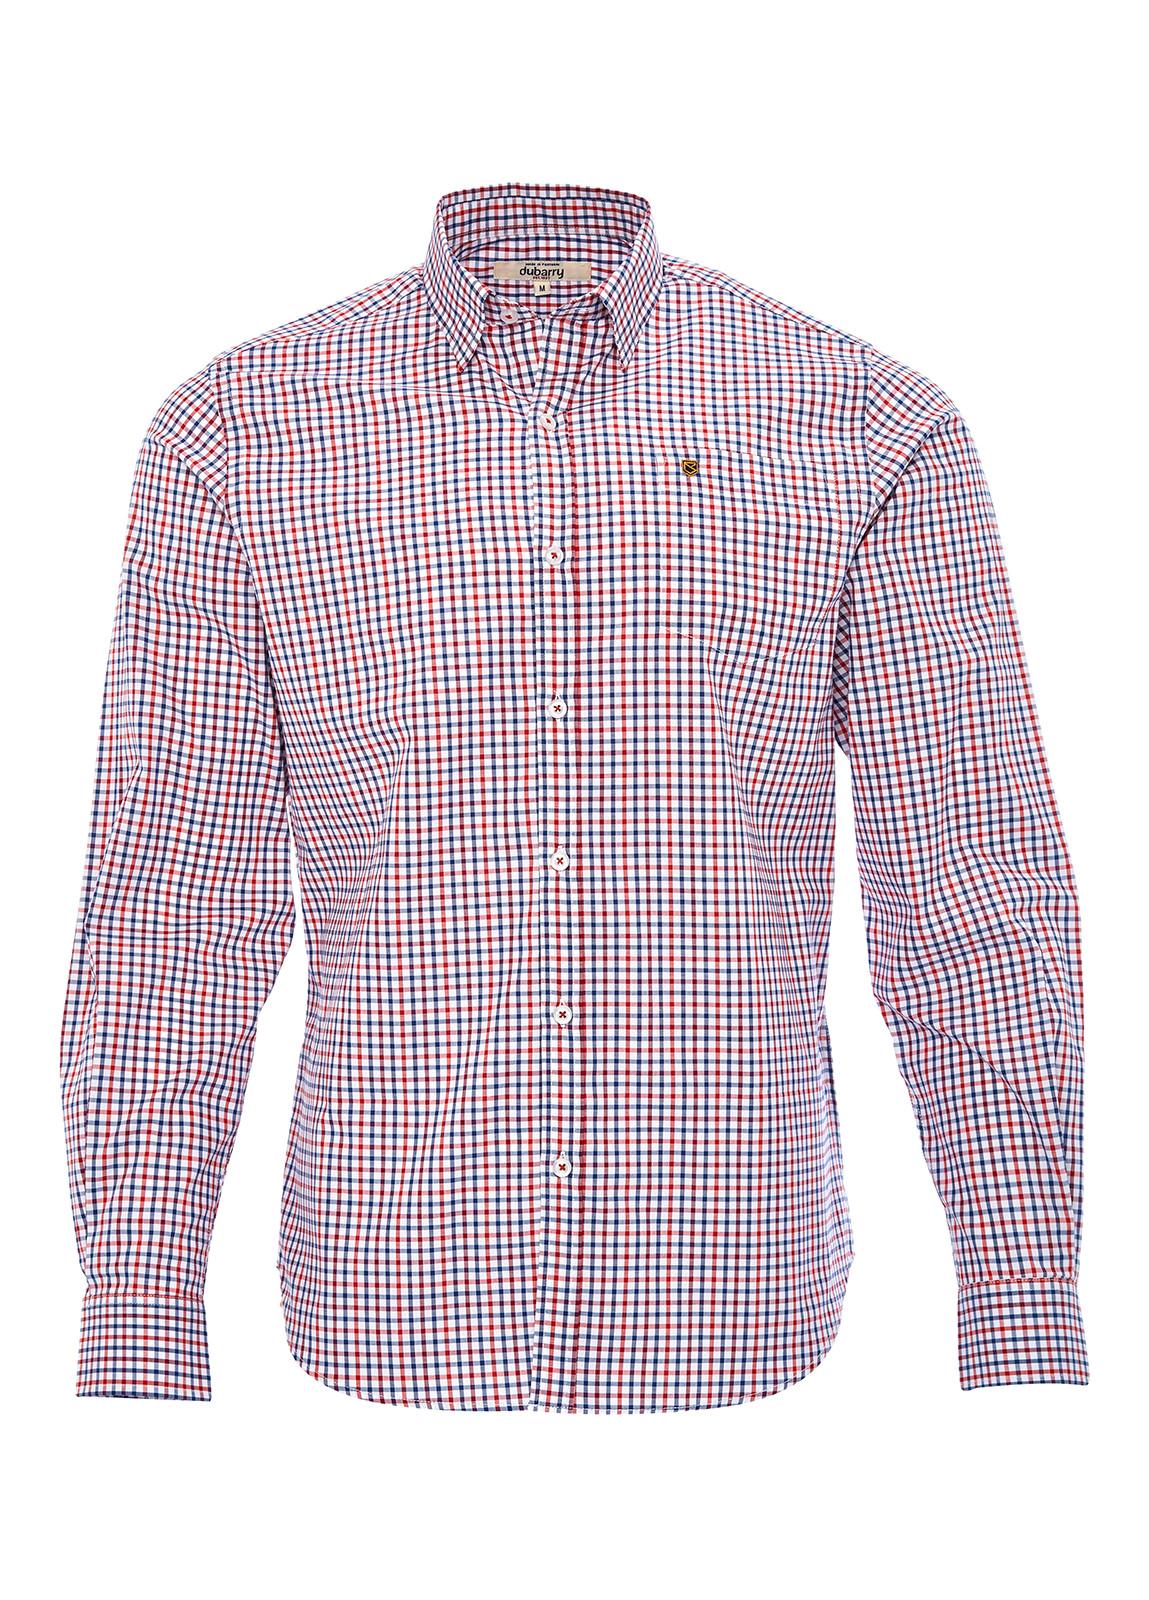 Dubarry_ Ballincollig shirt - Orchid_Image_2